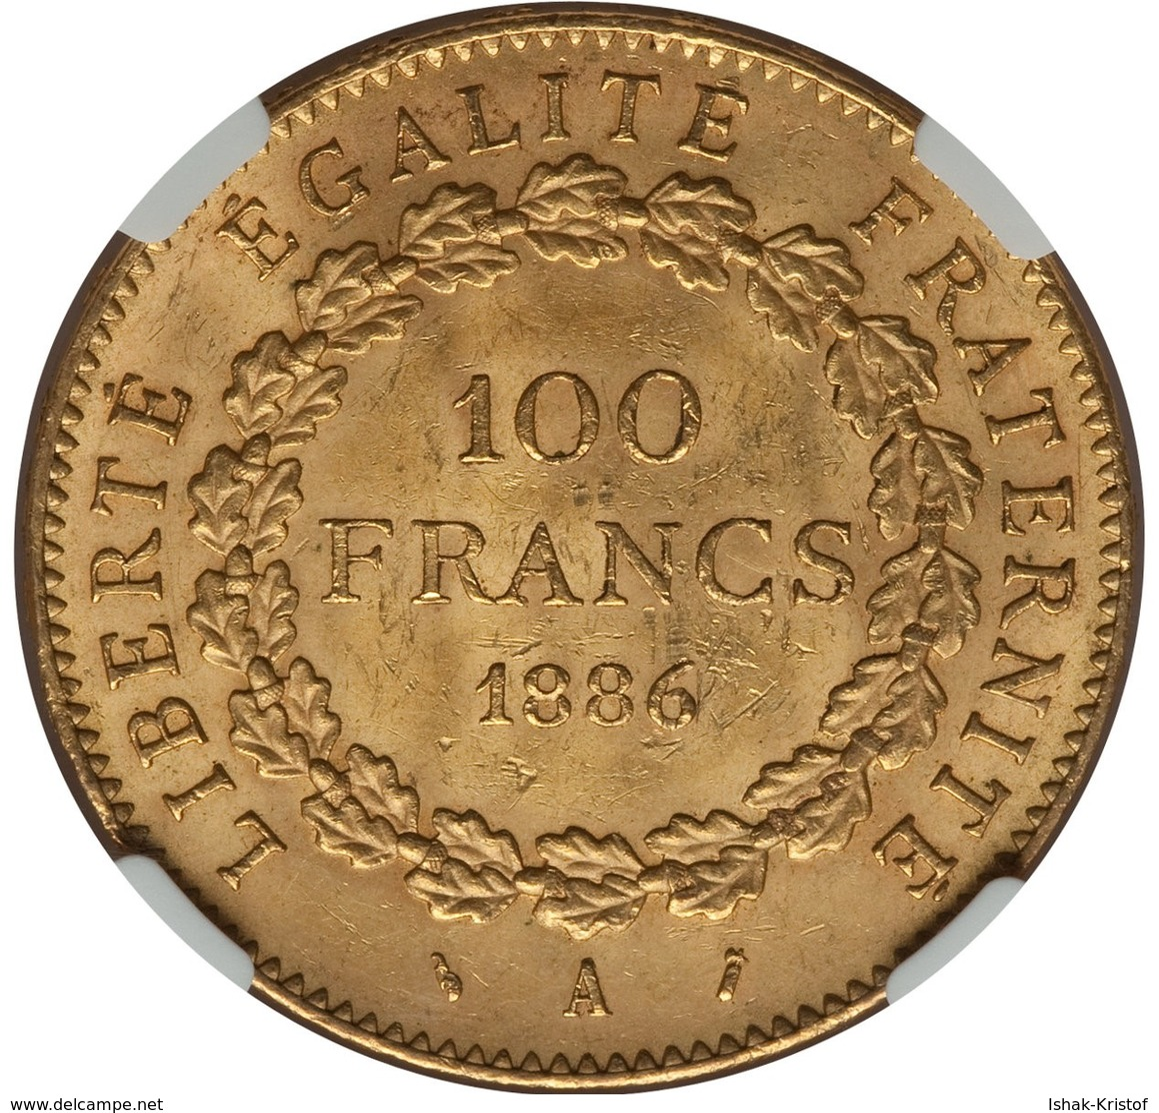 100 Francs Dupre 1886 A Gold - Gold